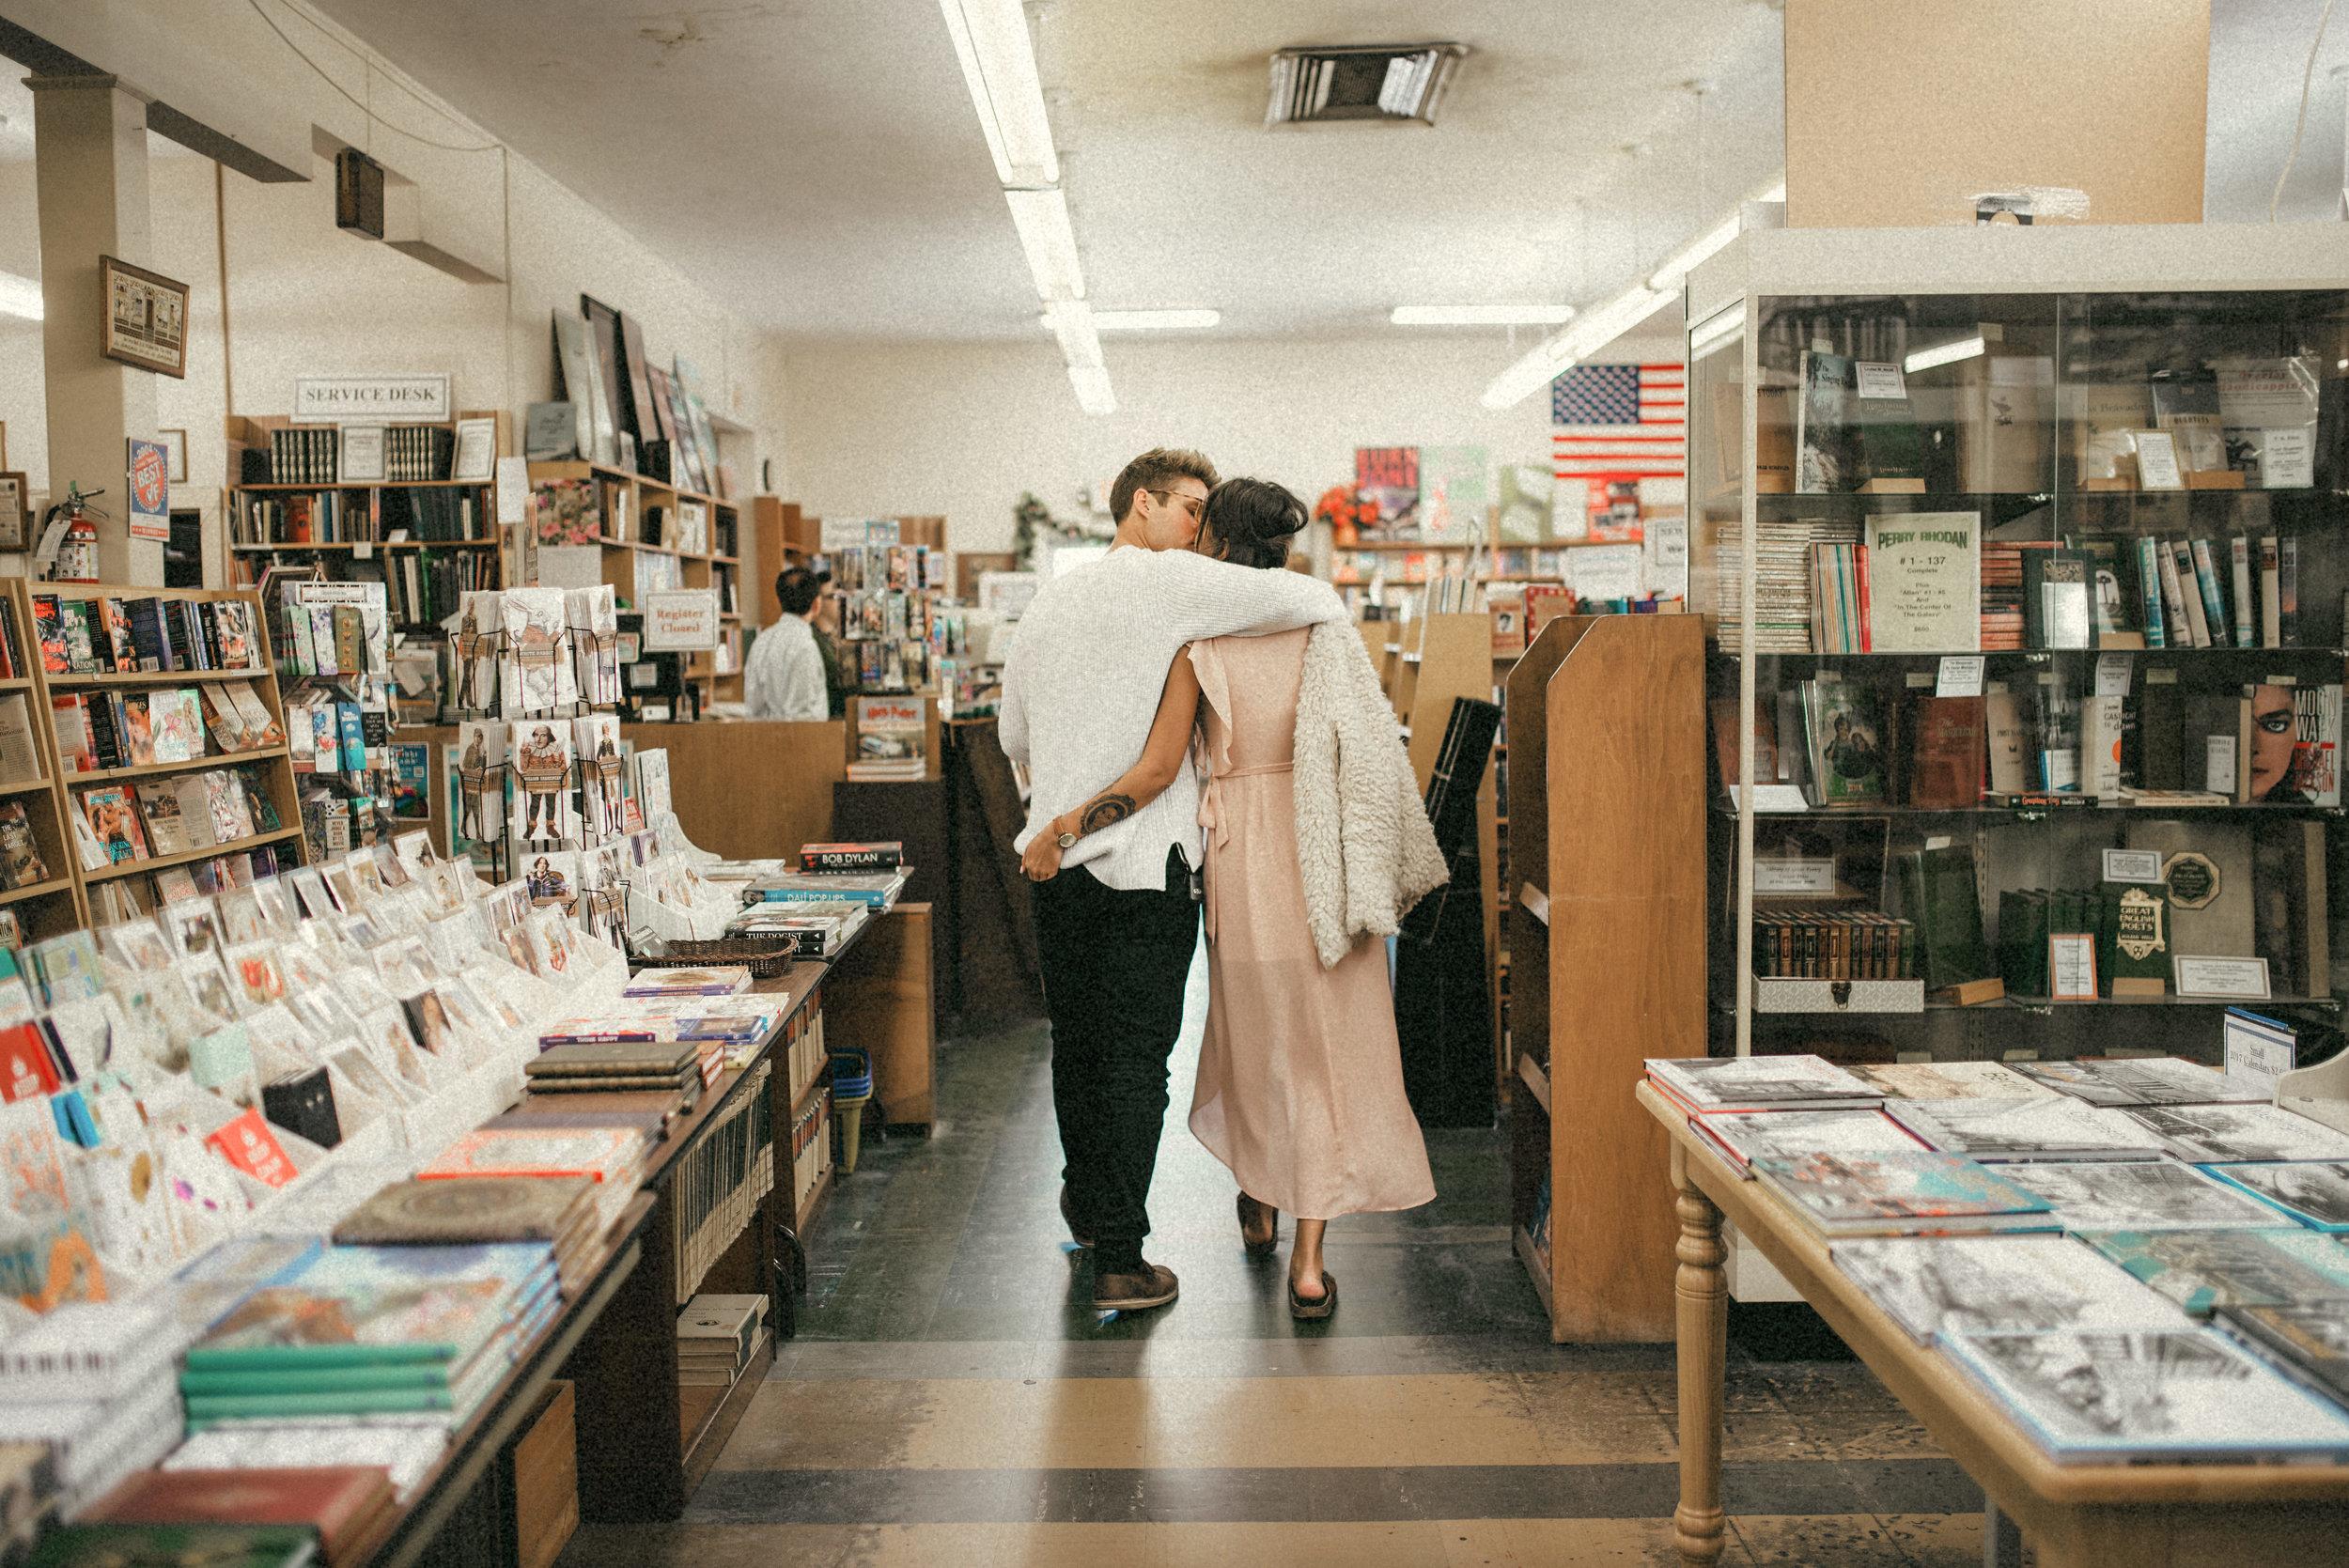 Hillary & Brandon walking out of bookstore - couple portraits - st pete florida - naples florida wedding photographer - tampa wedding photographer